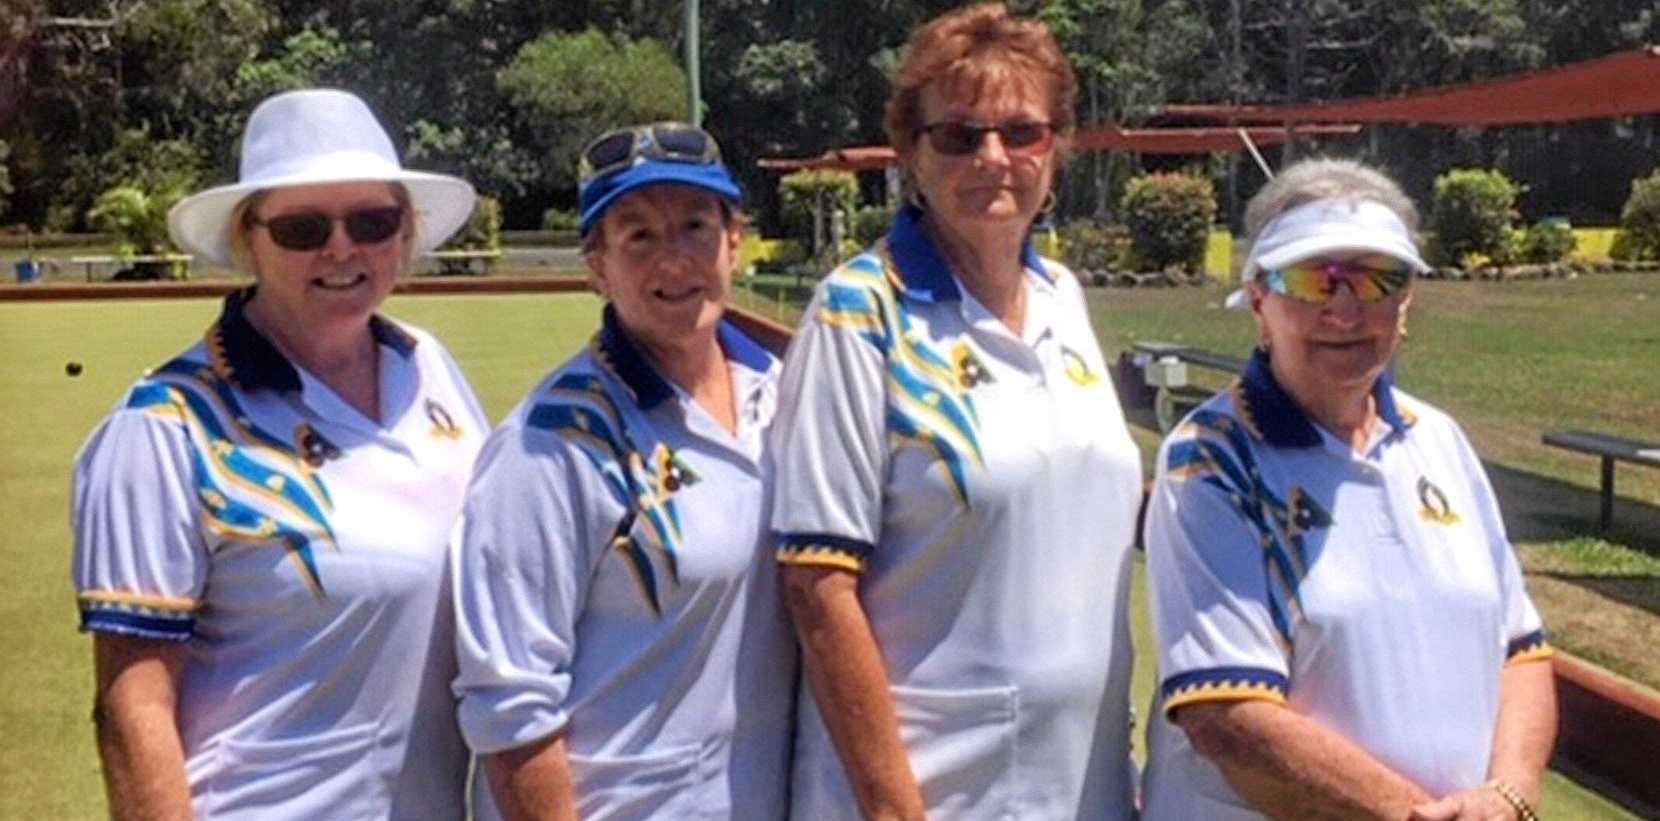 WINNERS: Brunswick Heads Women's Club Fours champions Jenny Andrew, Ilona Pettendy, Sherril Pearce and Lyn Proudlock.